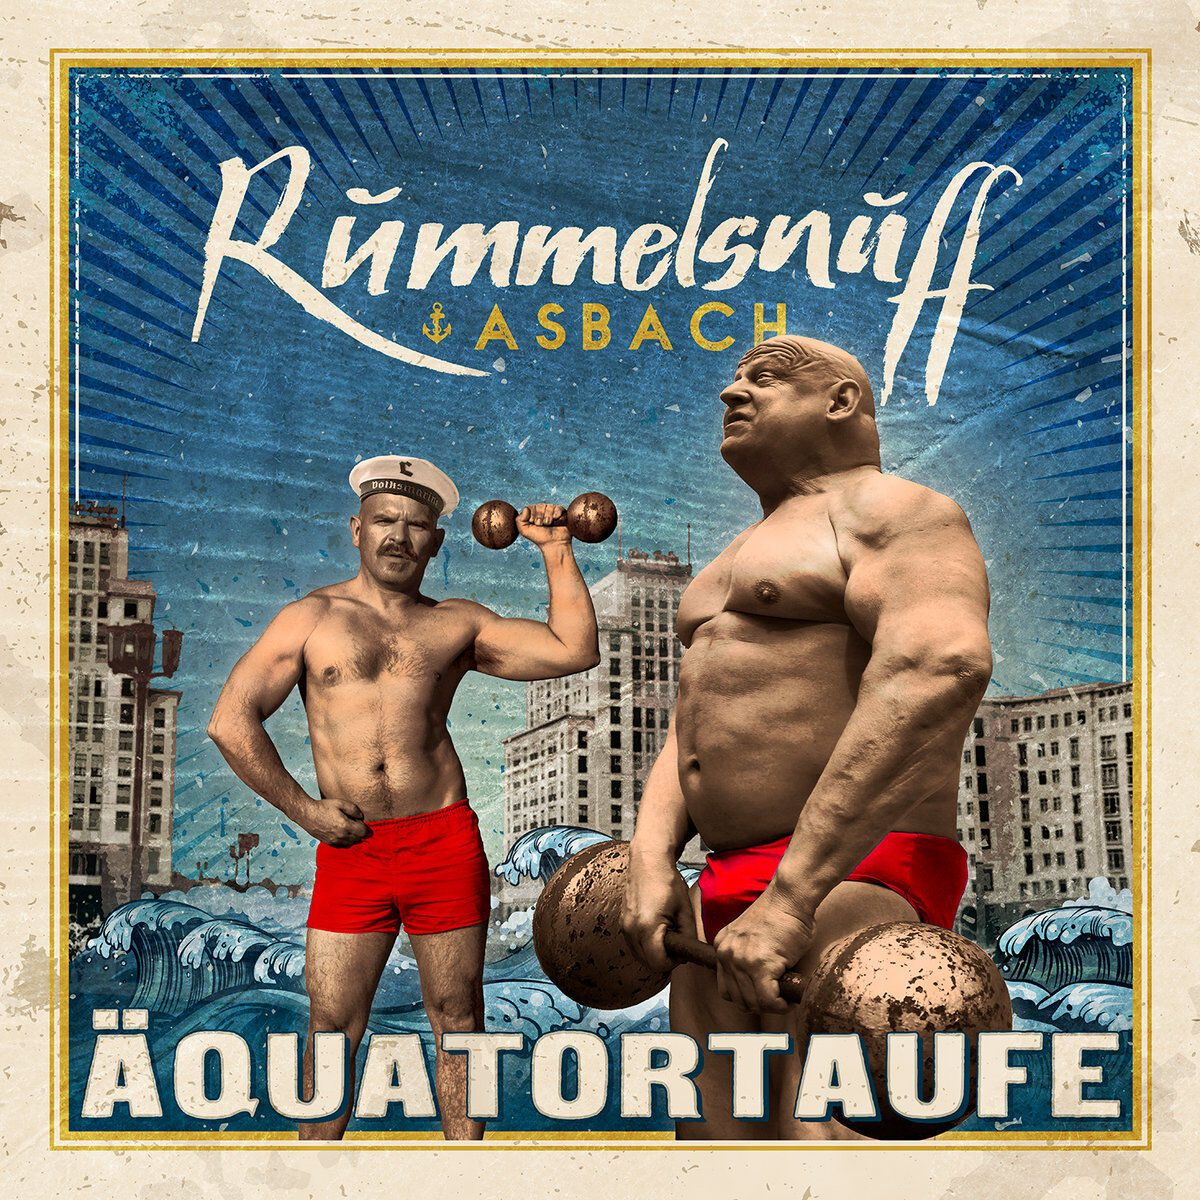 Rummelsnuff & Asbach release new album 'Äquatortaufe' in 2 formats